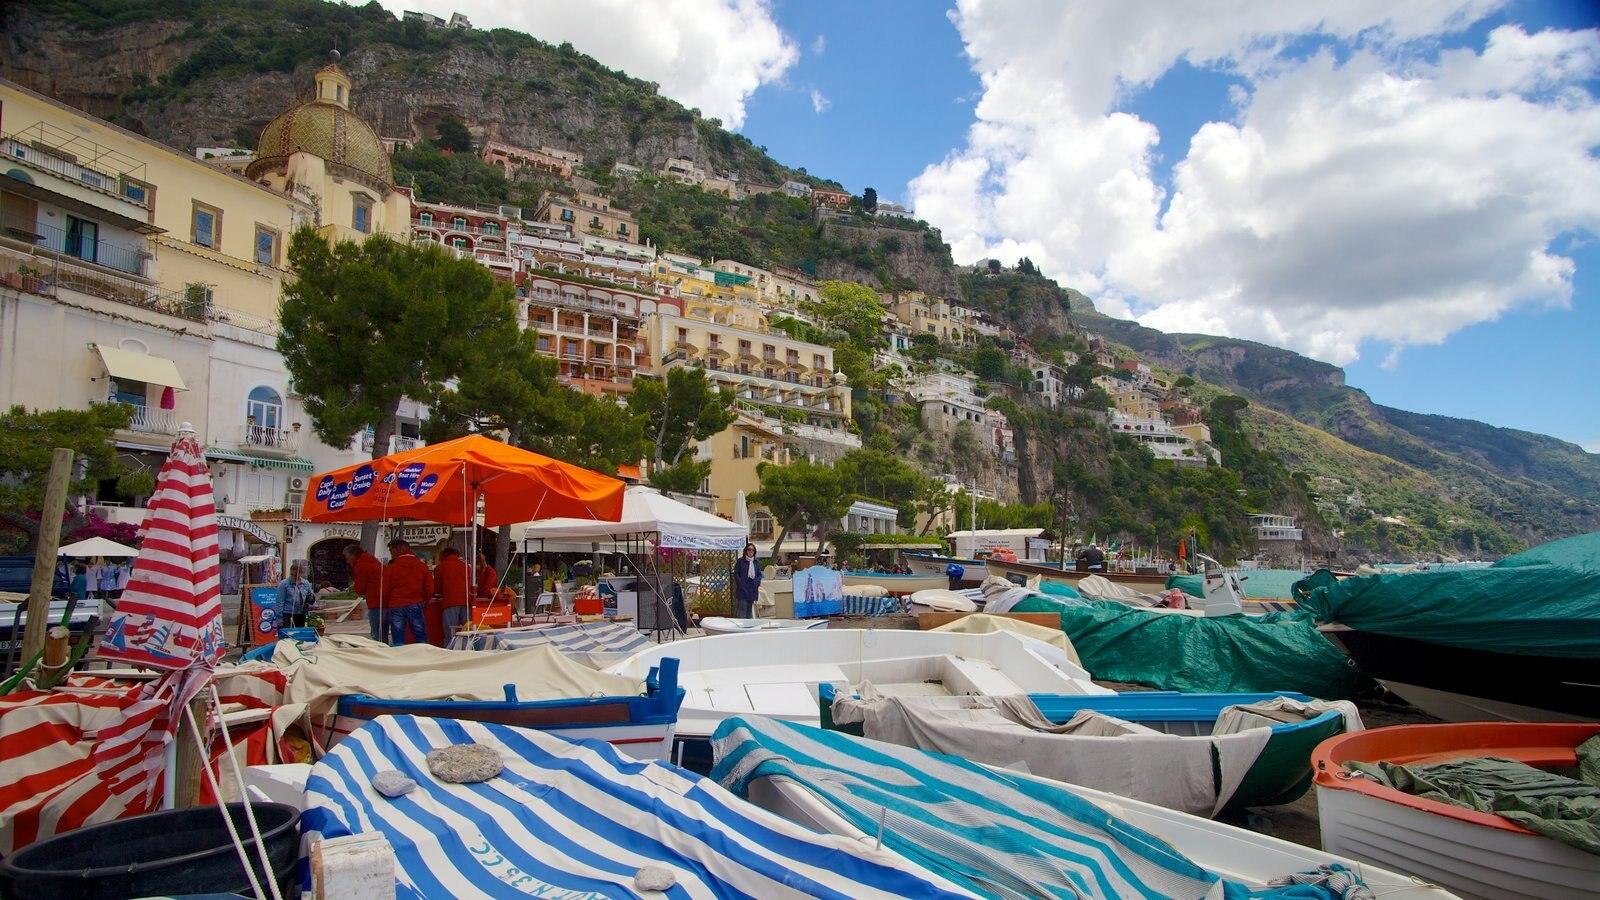 Positano featuring a coastal town